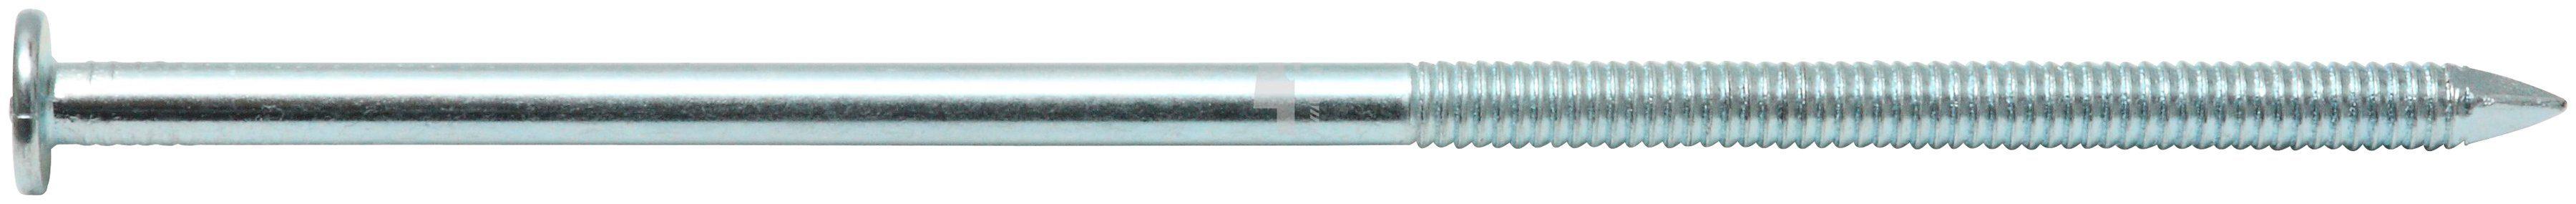 RAMSES Nagel , Sparrennägel 6 x 260 mm Stahl, 100 Stk.